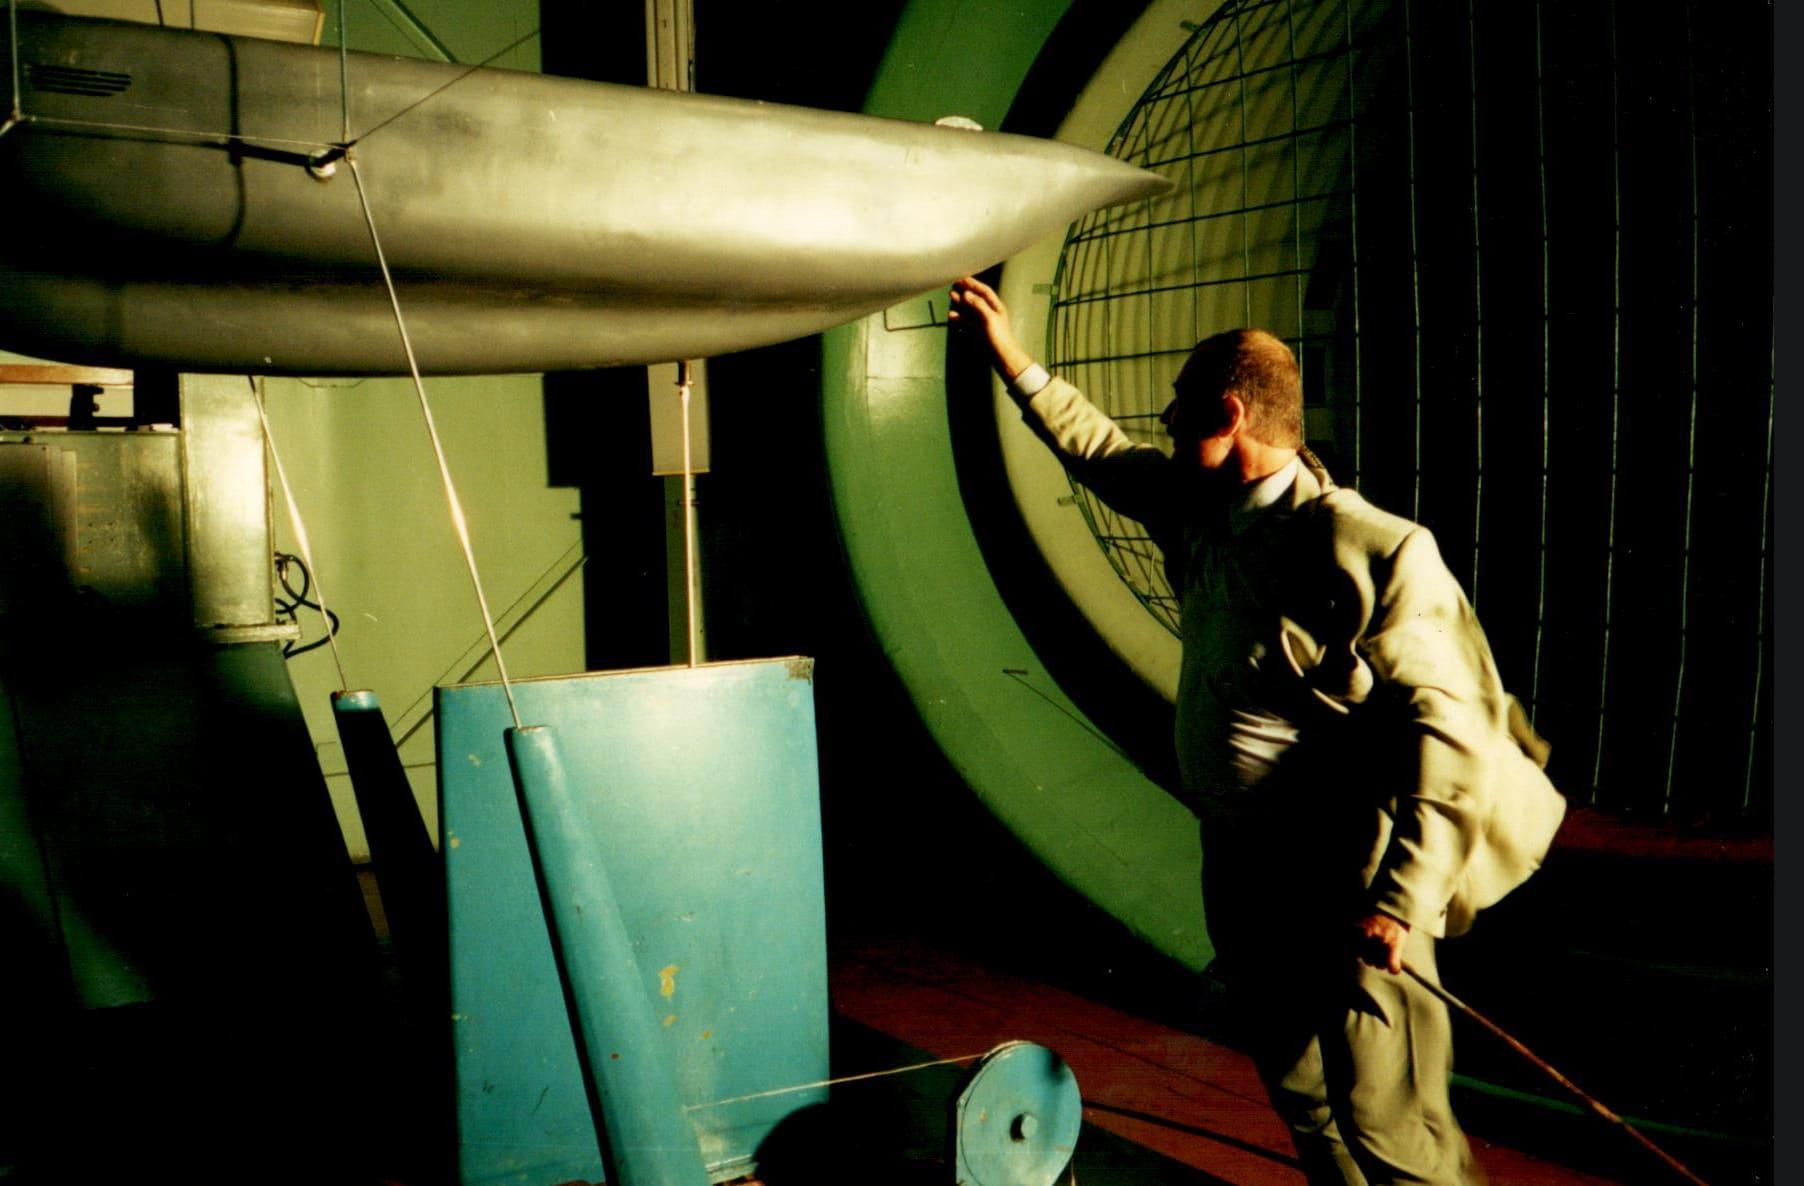 Espellere un Unibus in due parti in una galleria del vento. Ottobre 2000